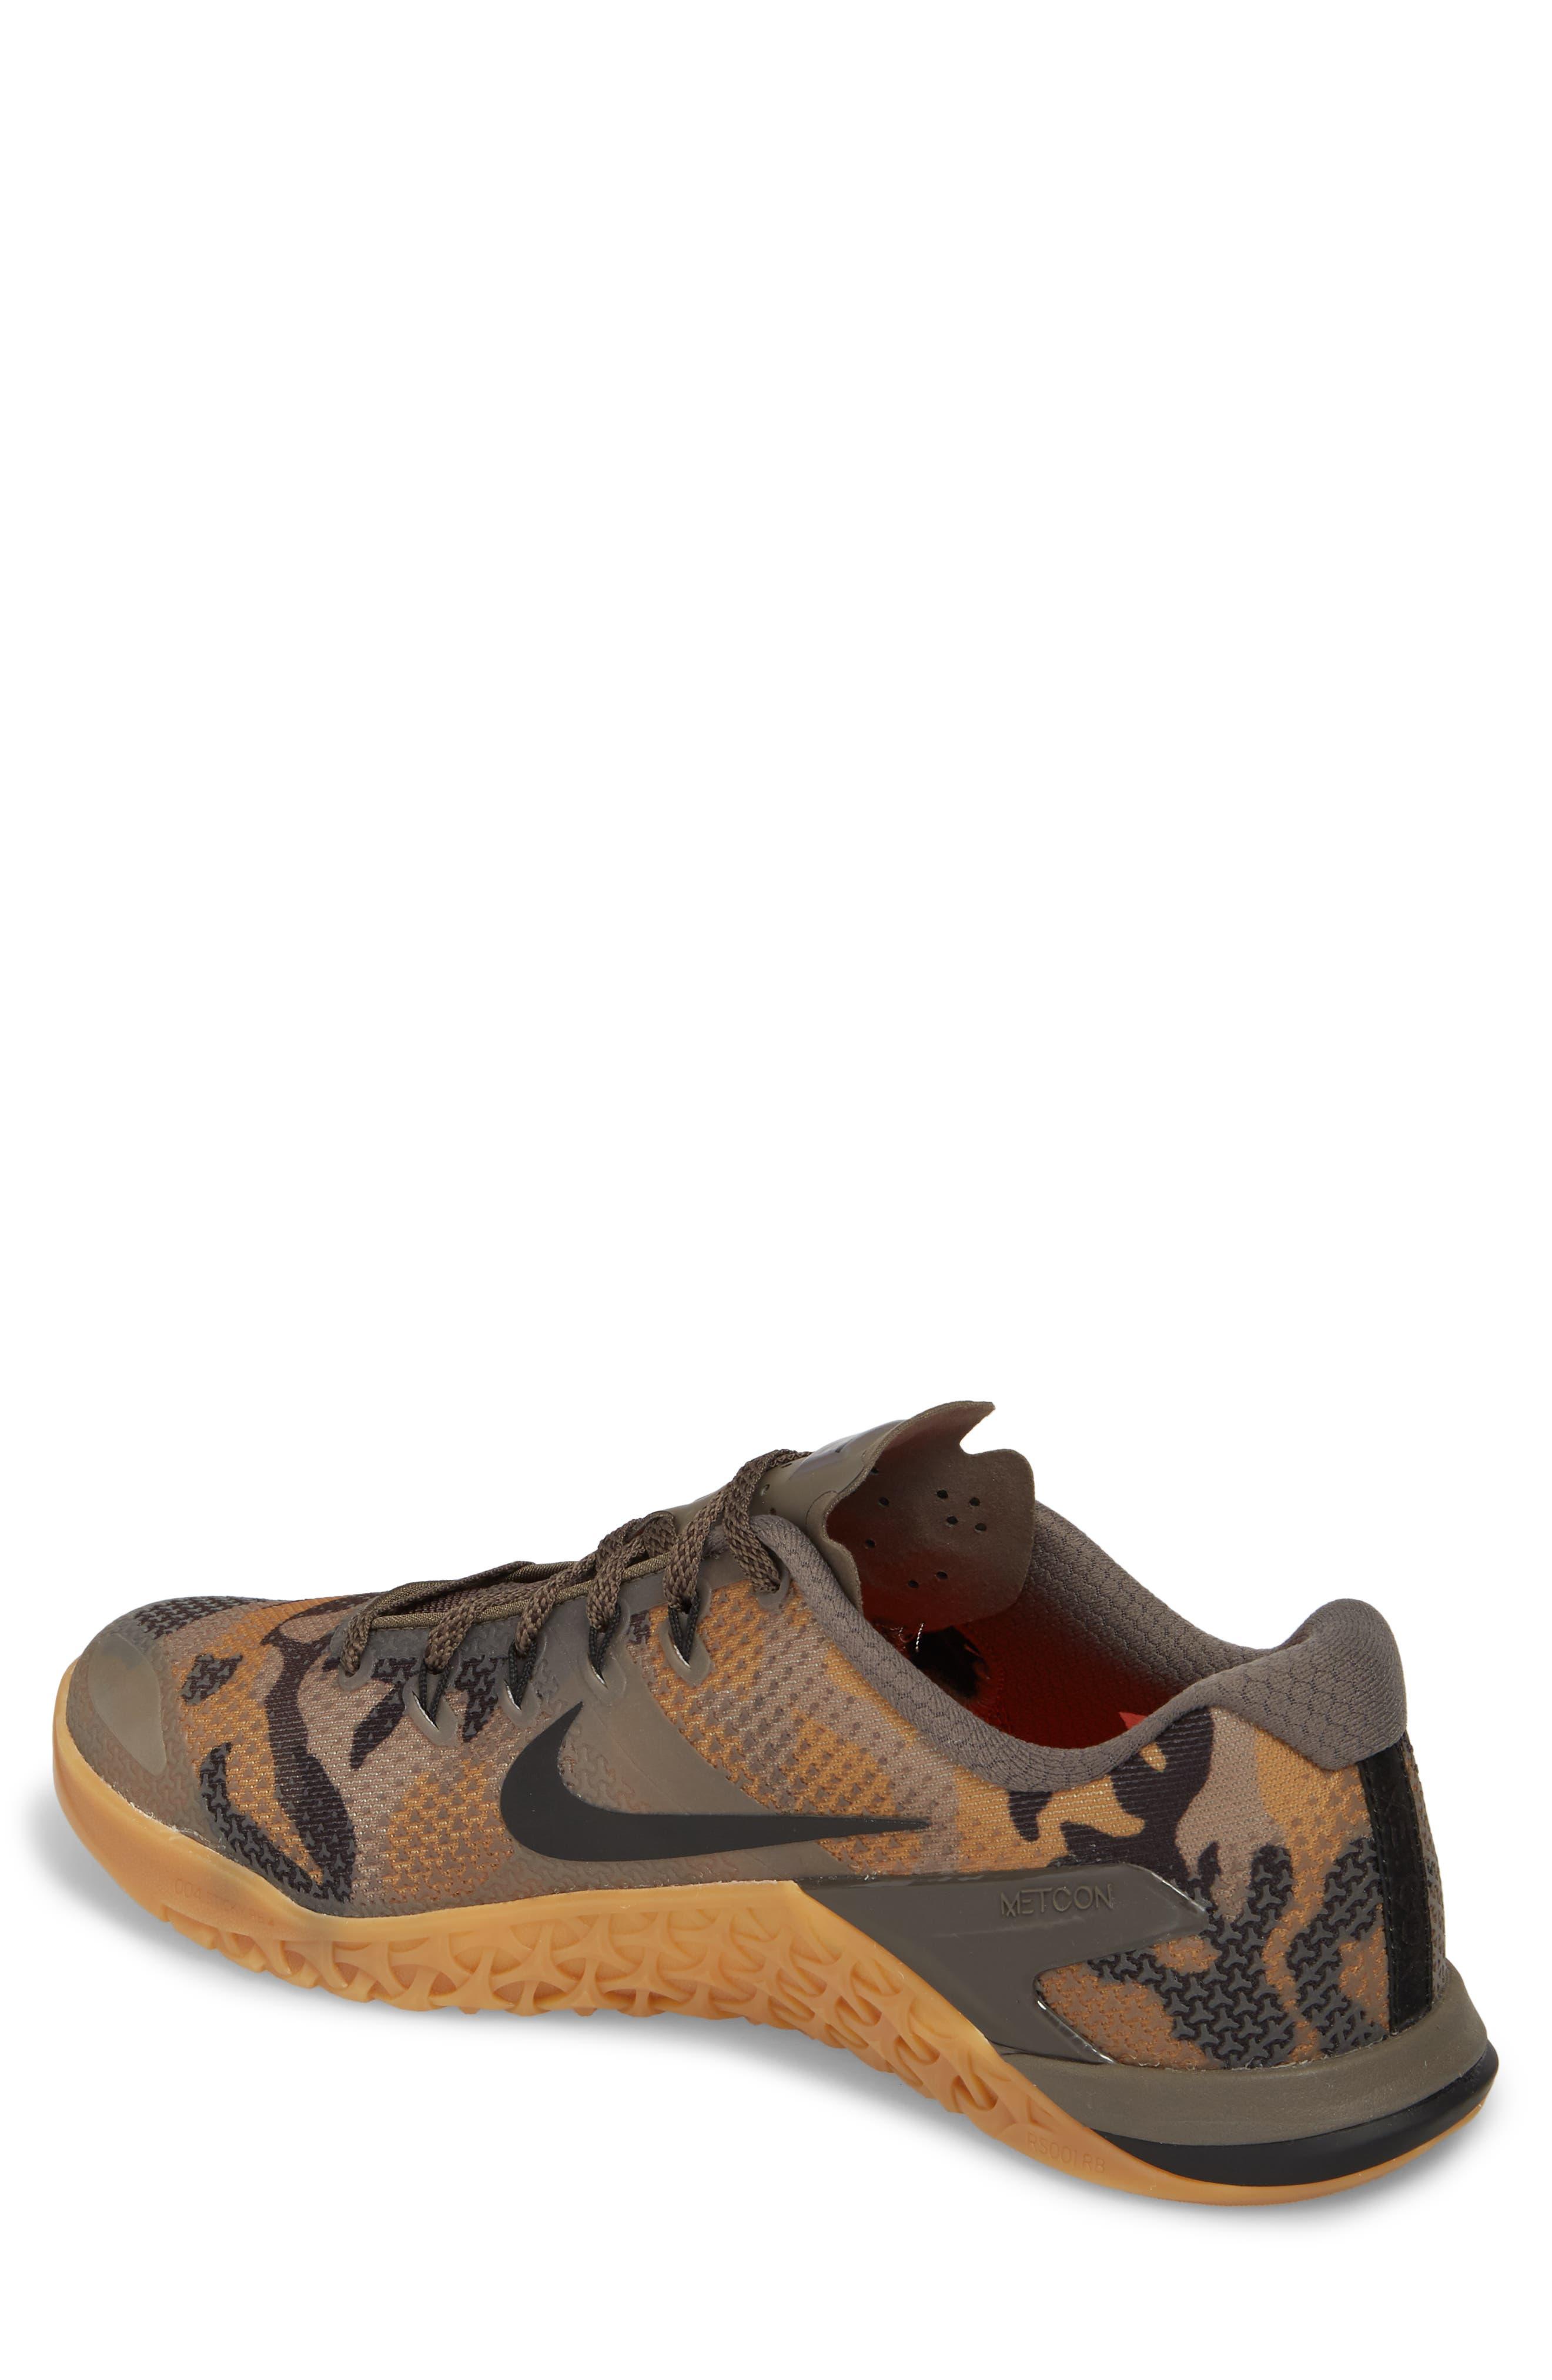 Metcon 4 Training Shoe,                             Alternate thumbnail 31, color,